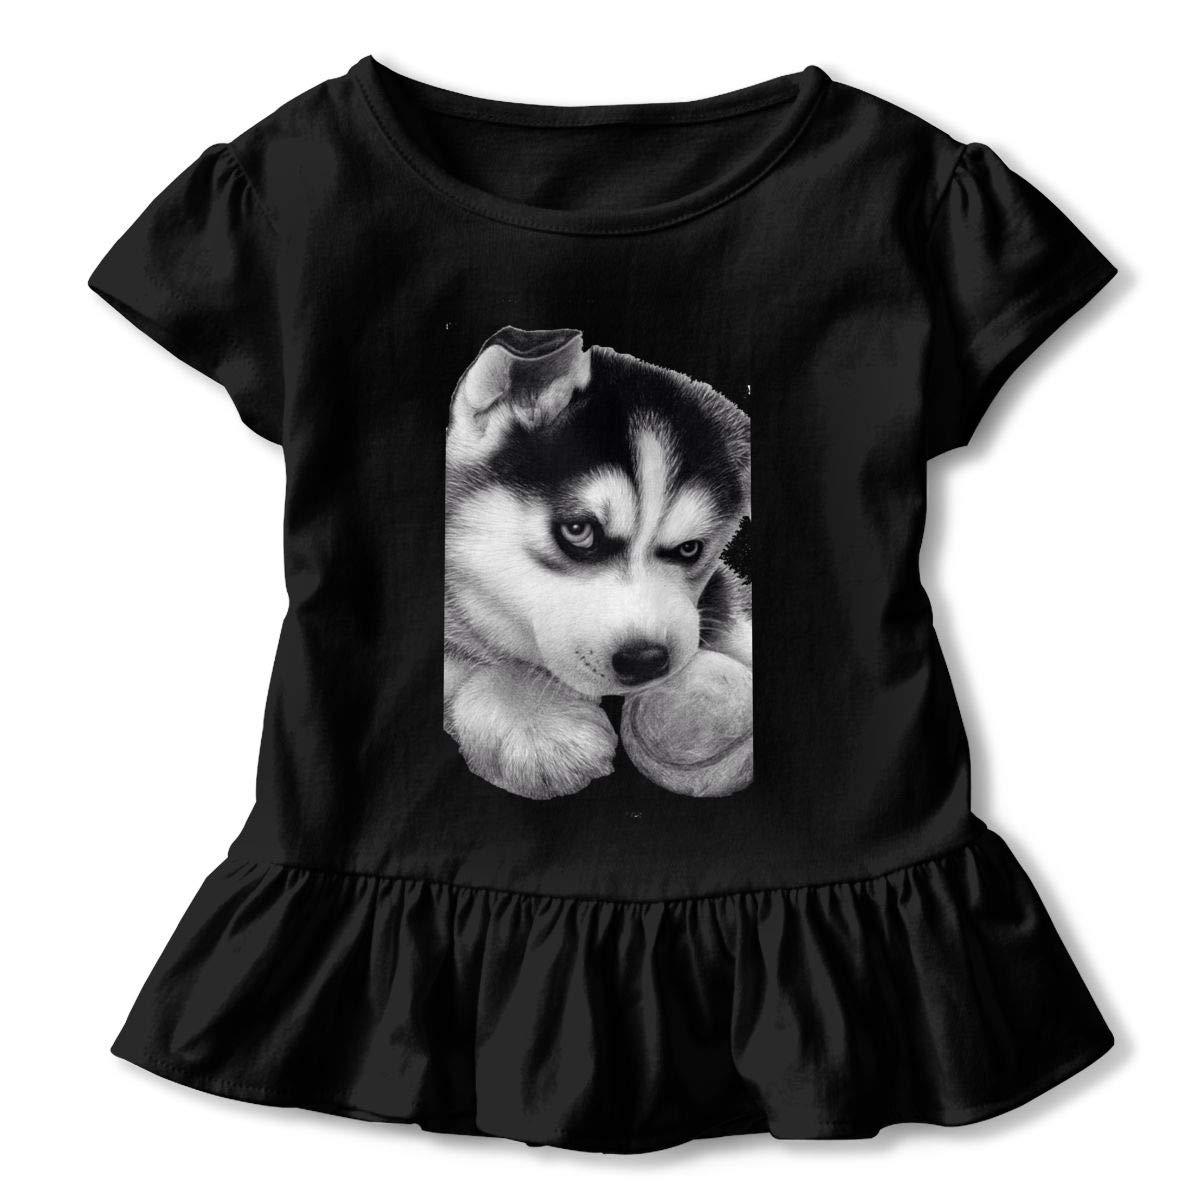 Kwai-h Dog Outdoor Lover Short-Sleeve Tunic T-Shirt